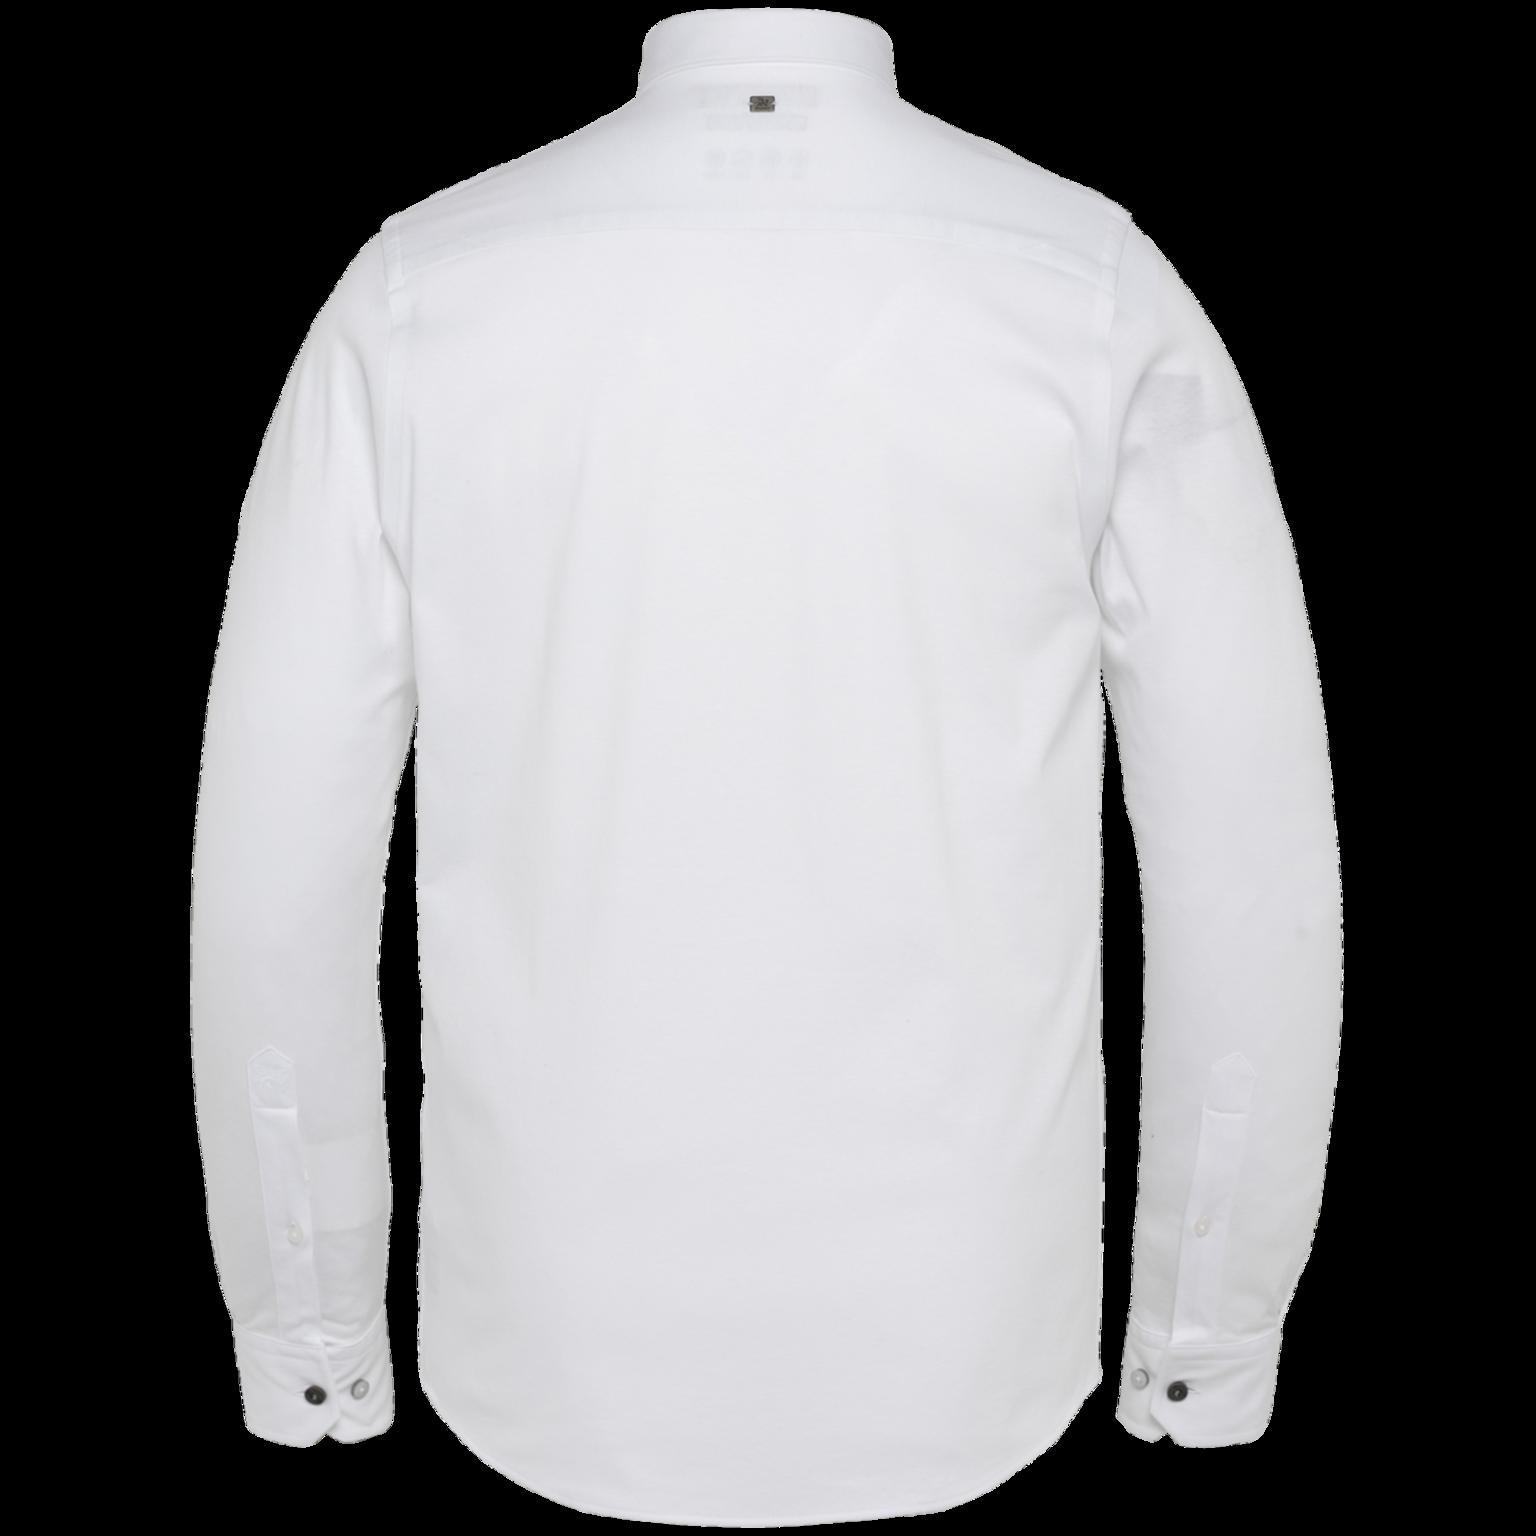 VANGUARD chemise longues manches jersey-2